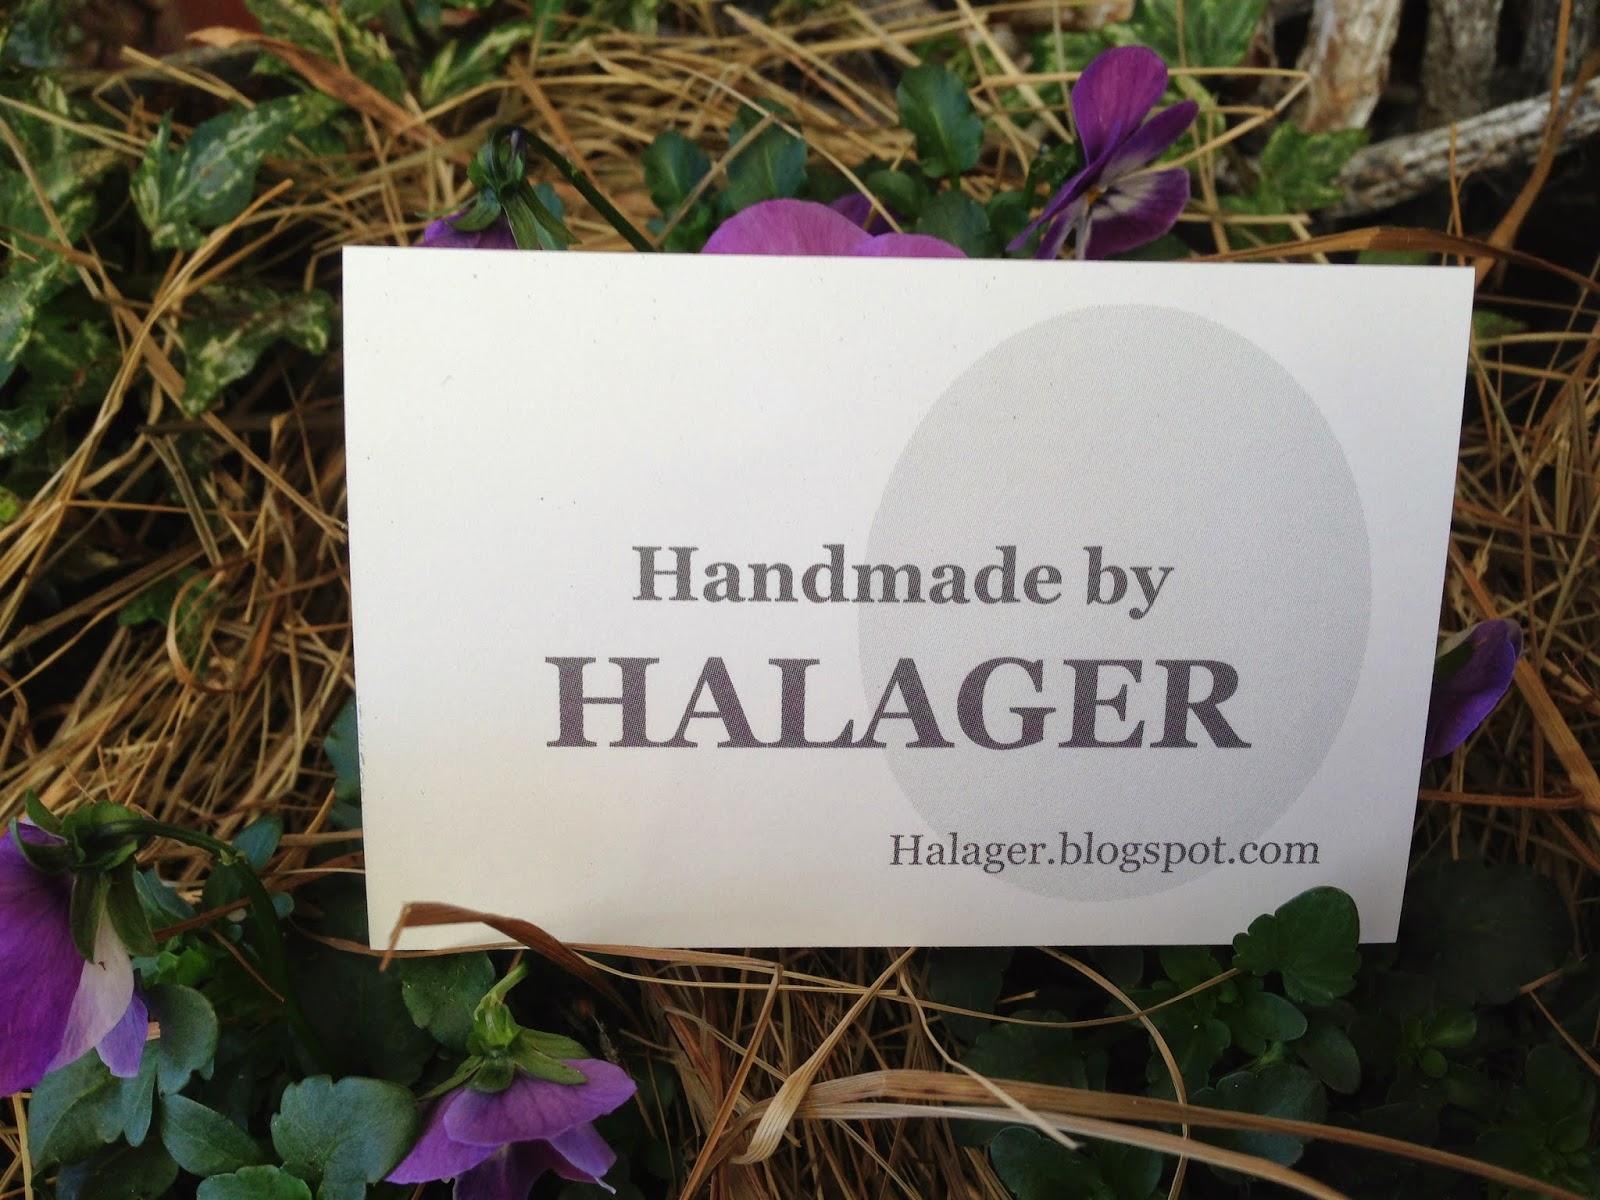 http://halager.blogspot.dk/